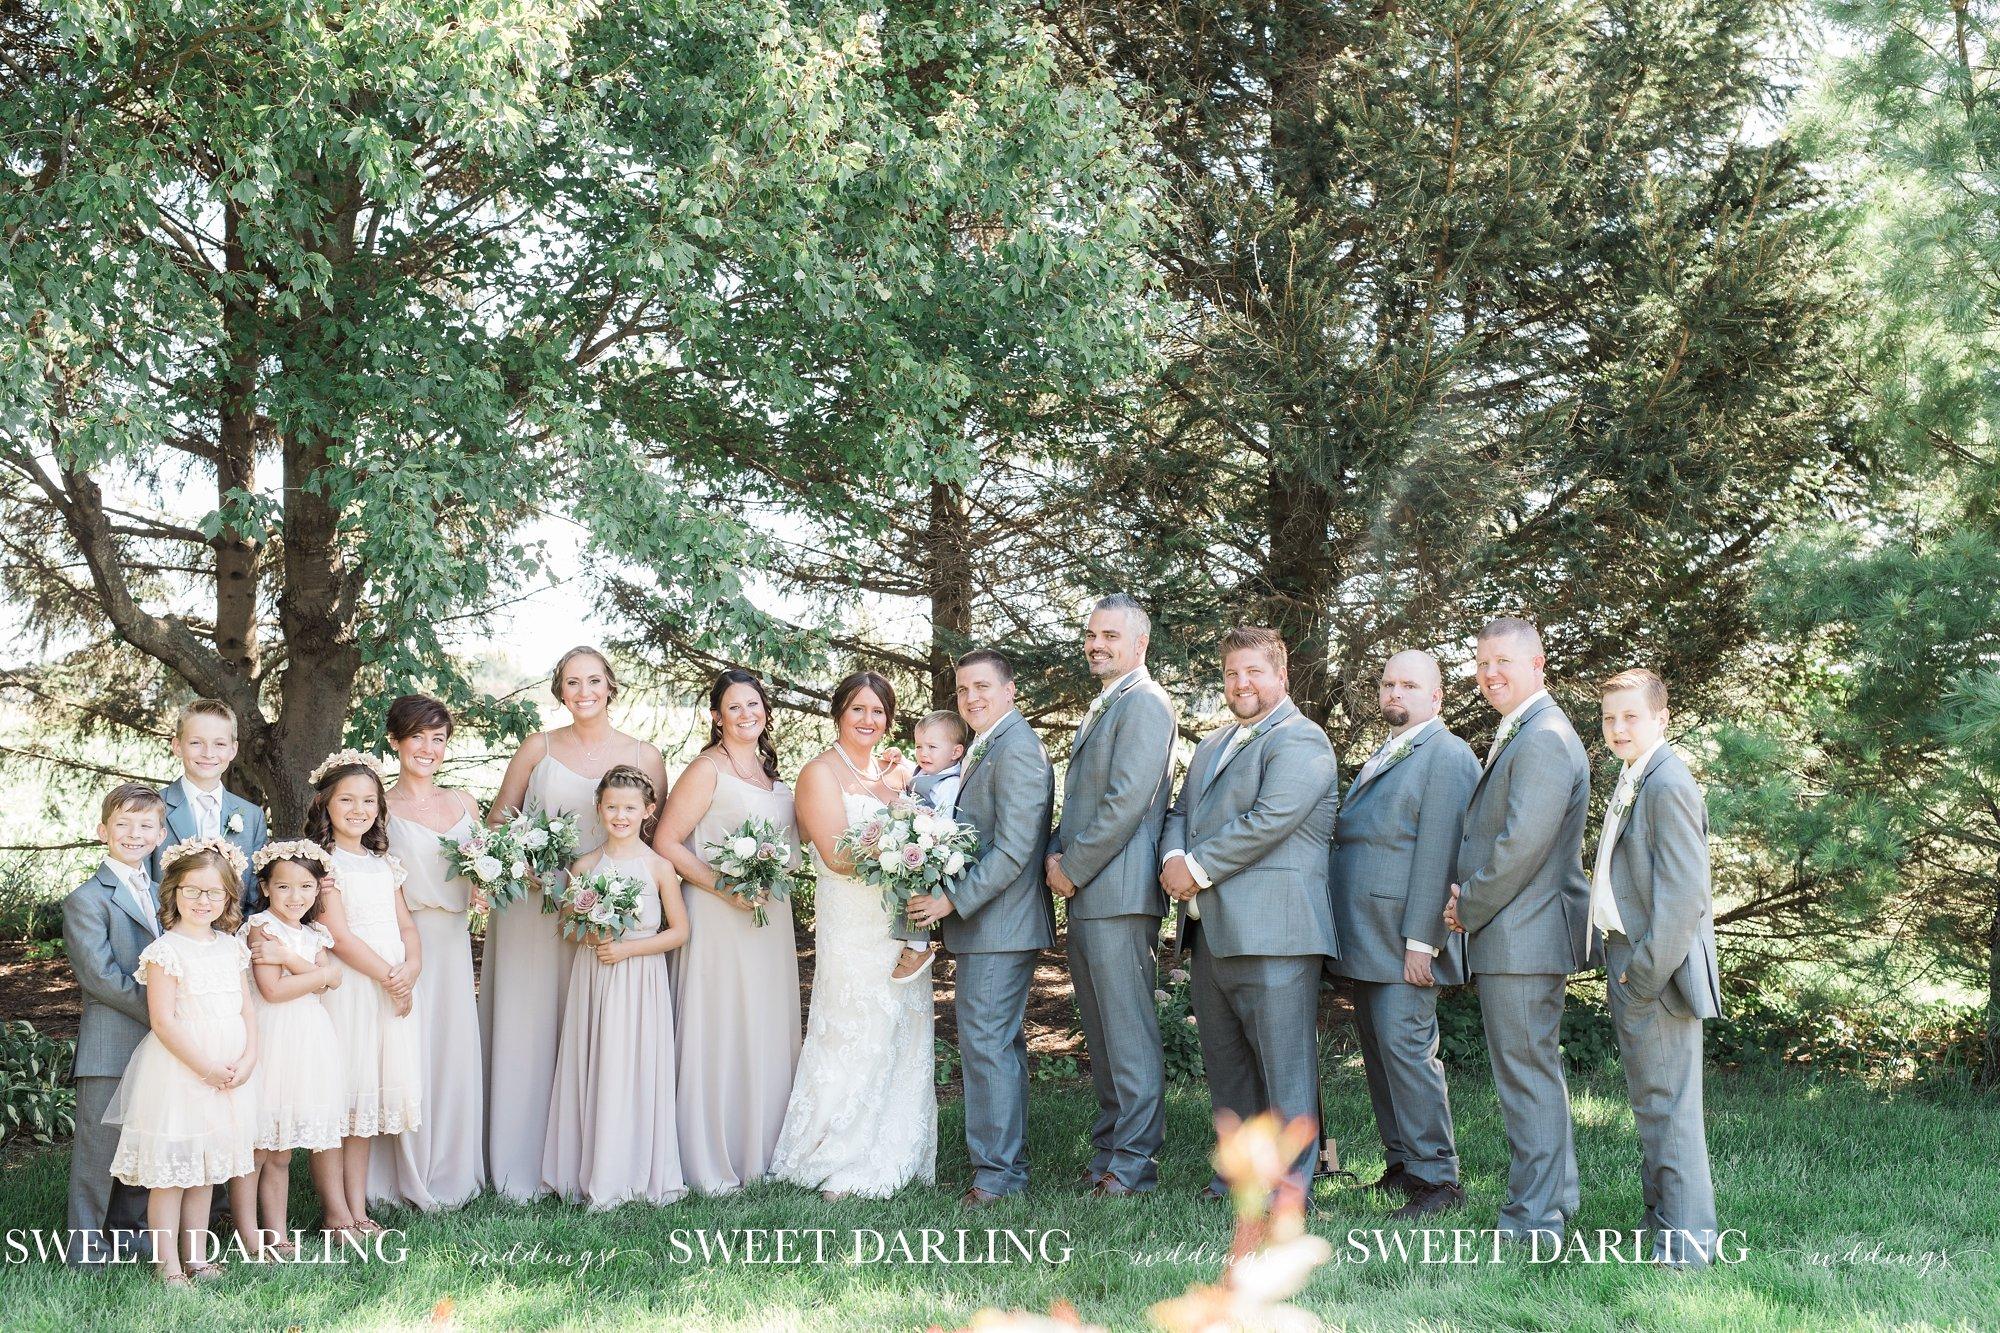 Bridal party at fall pear tree estate wedding